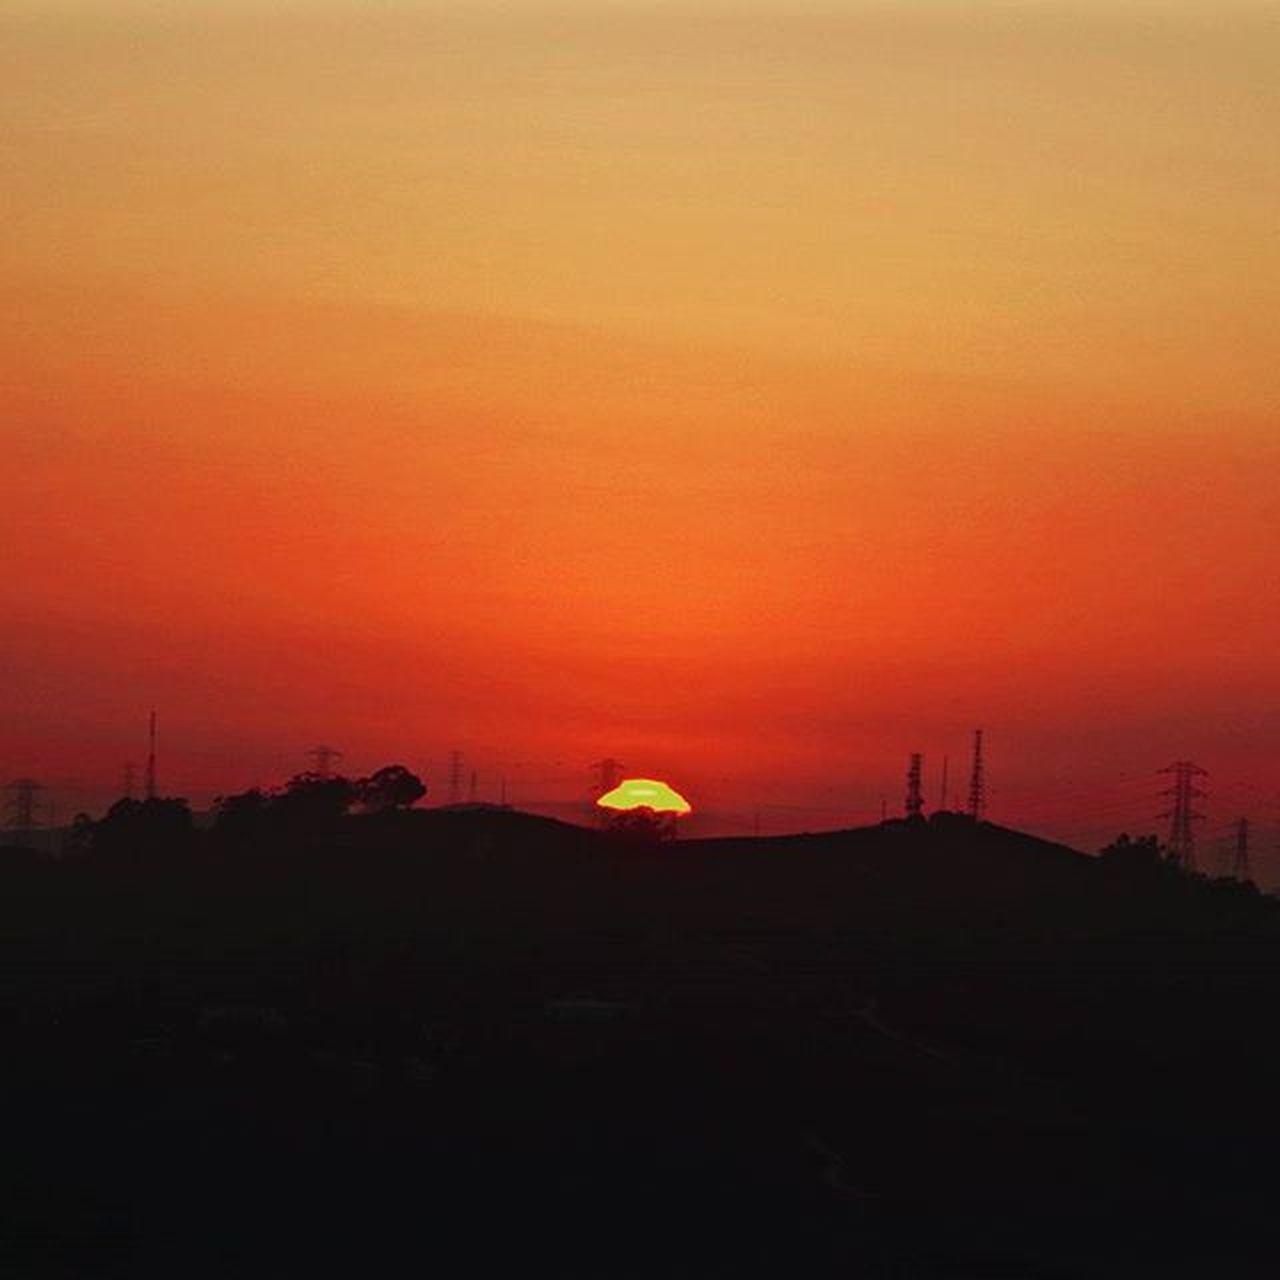 Sunset <August 22> Sunsets are one of the most beautiful things. Augustphotochallenge Viewfromafar Sunset GodIsGood GodsGlory Gorgeous RedSky Pentax Pentaxcamera Pentaxk50 Pentaxiansstandup Pantaxagram Pentaxiansunite